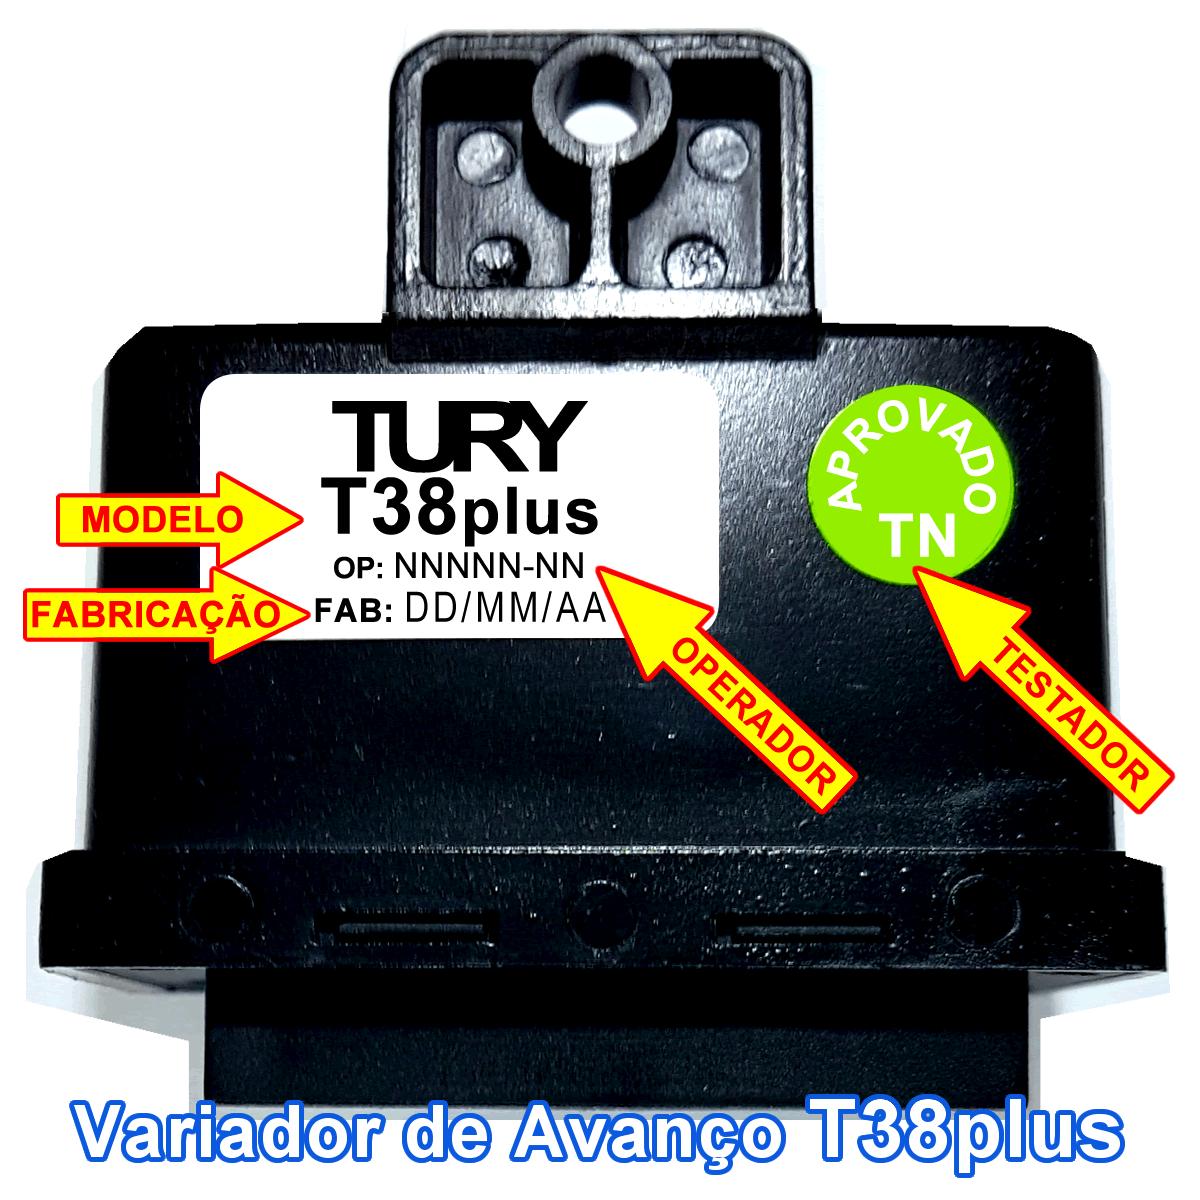 Variador de Avanço T38 Plus TURY GAS MAP/MAF